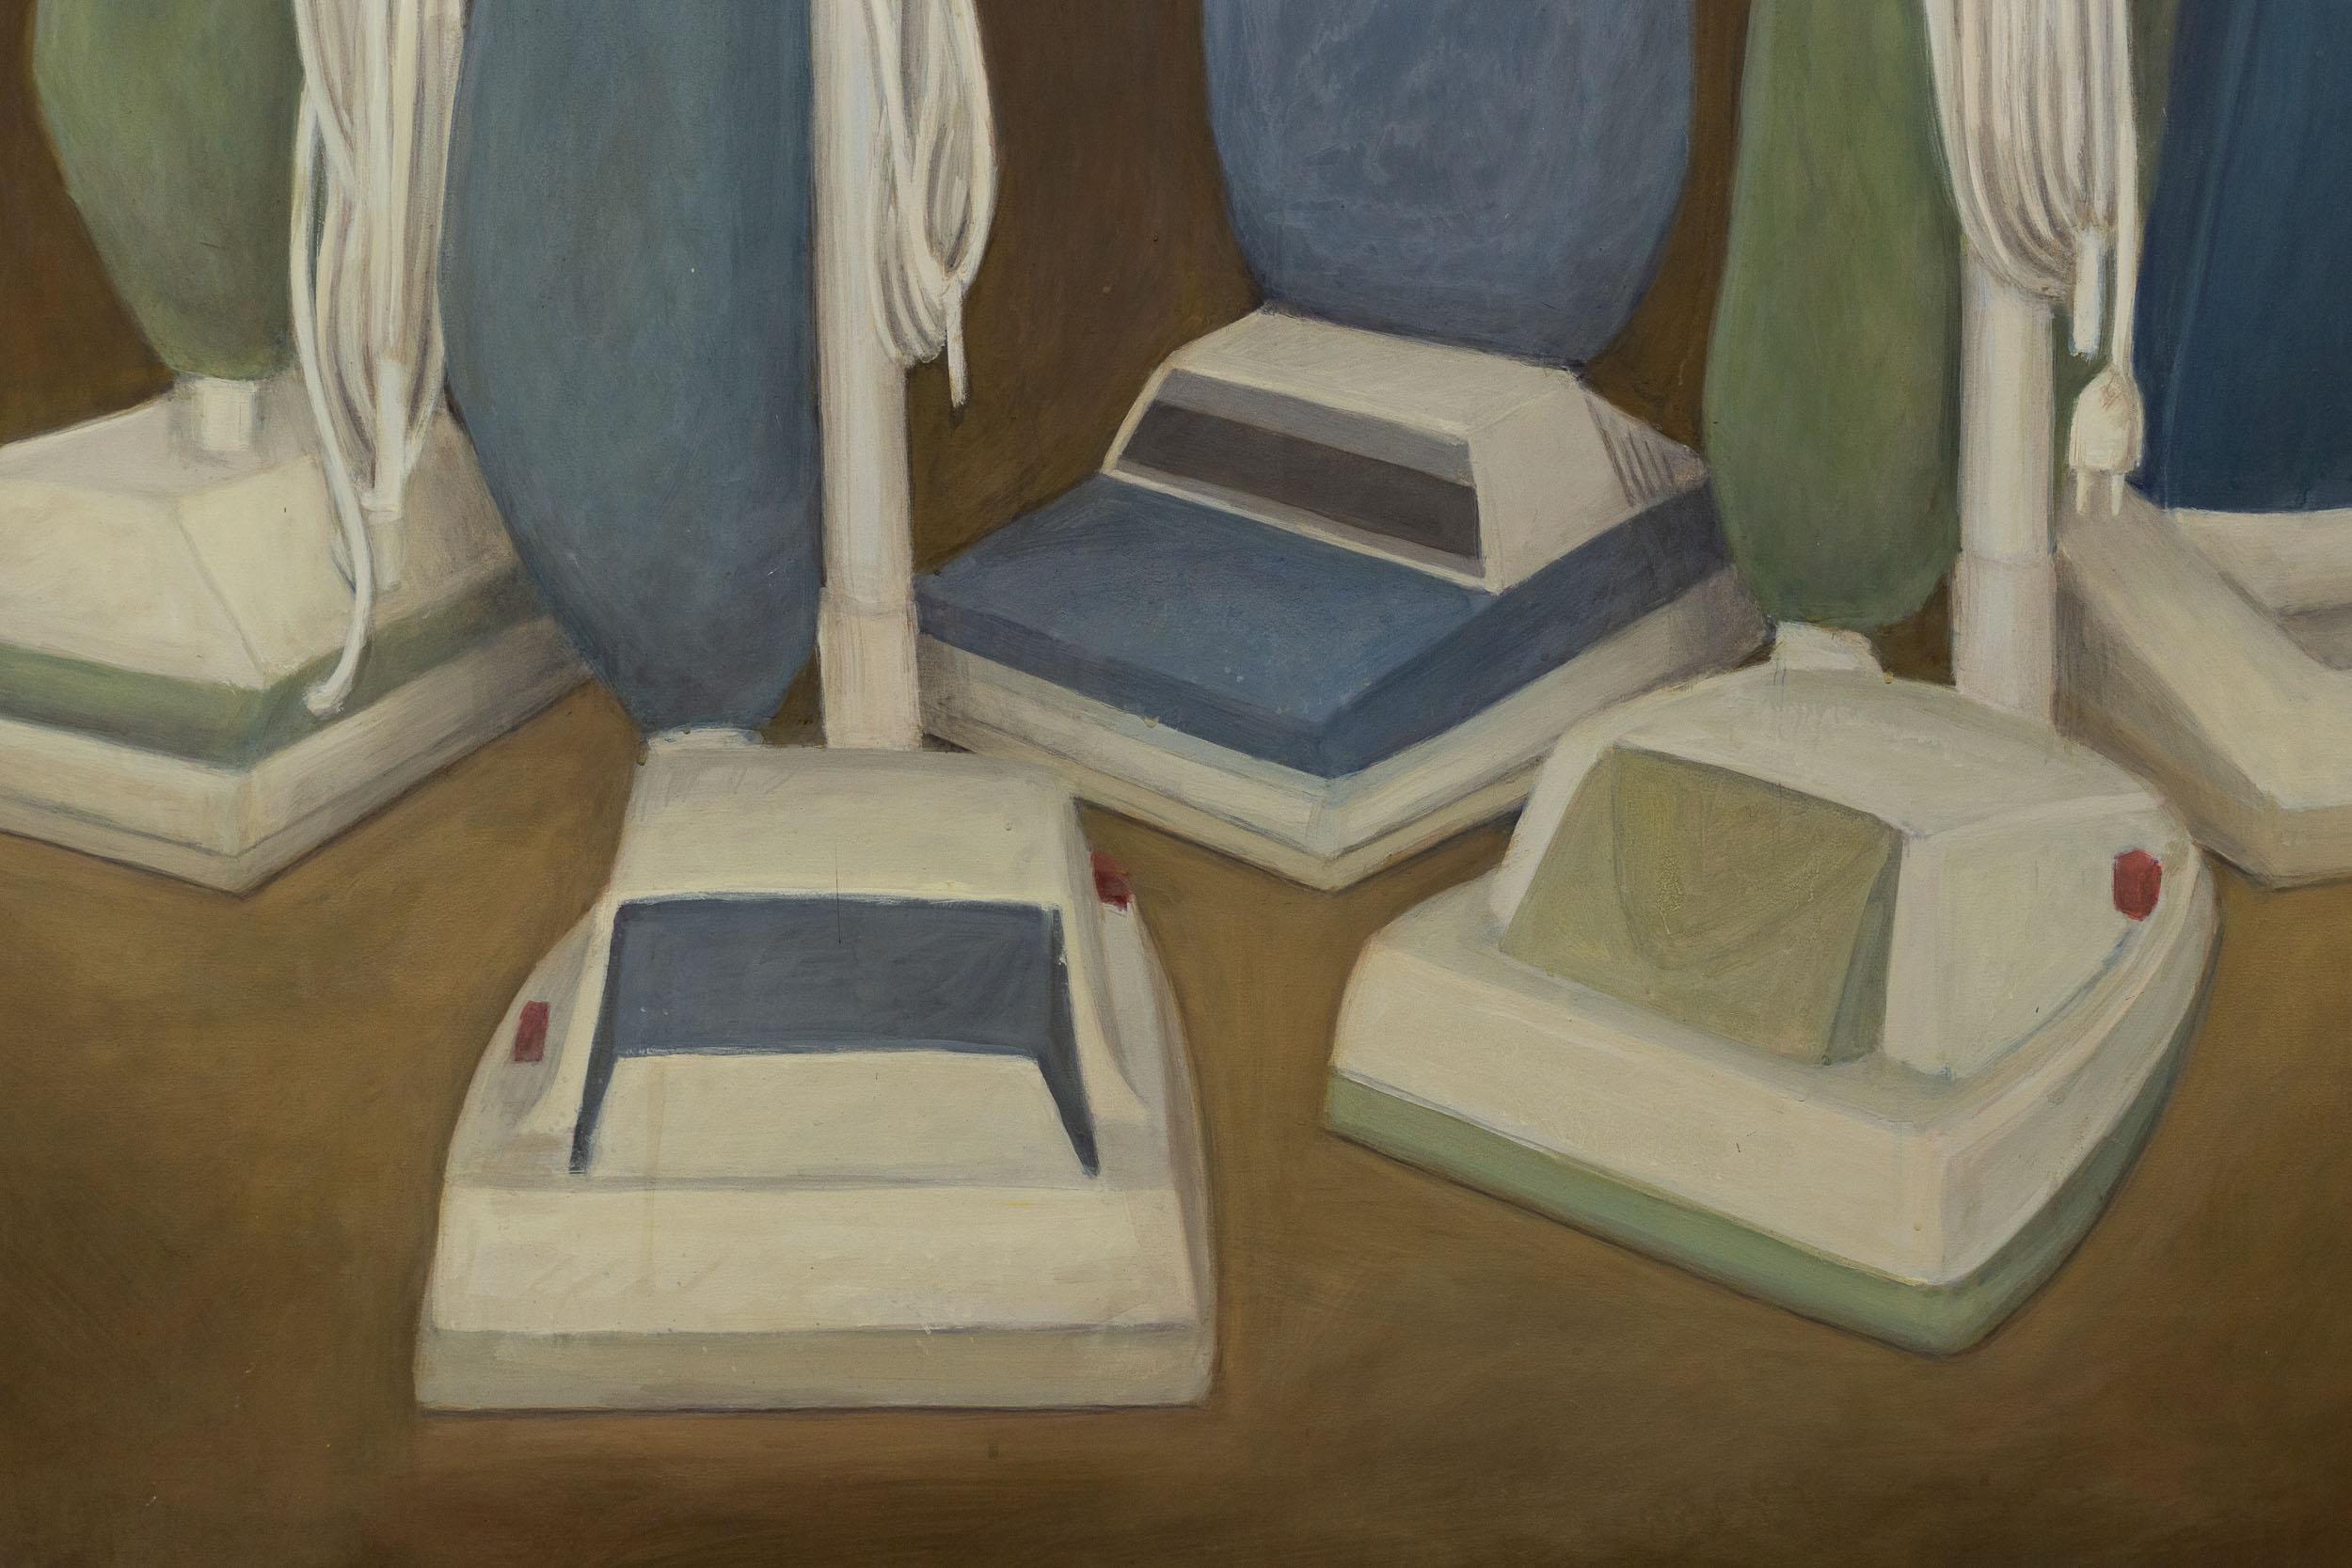 Christoph Hänsli,  The Congress  (detail), 1999, egg tempera and acrylic on canvas, 160 x 130 cm  Photo: Kilian Bannwart